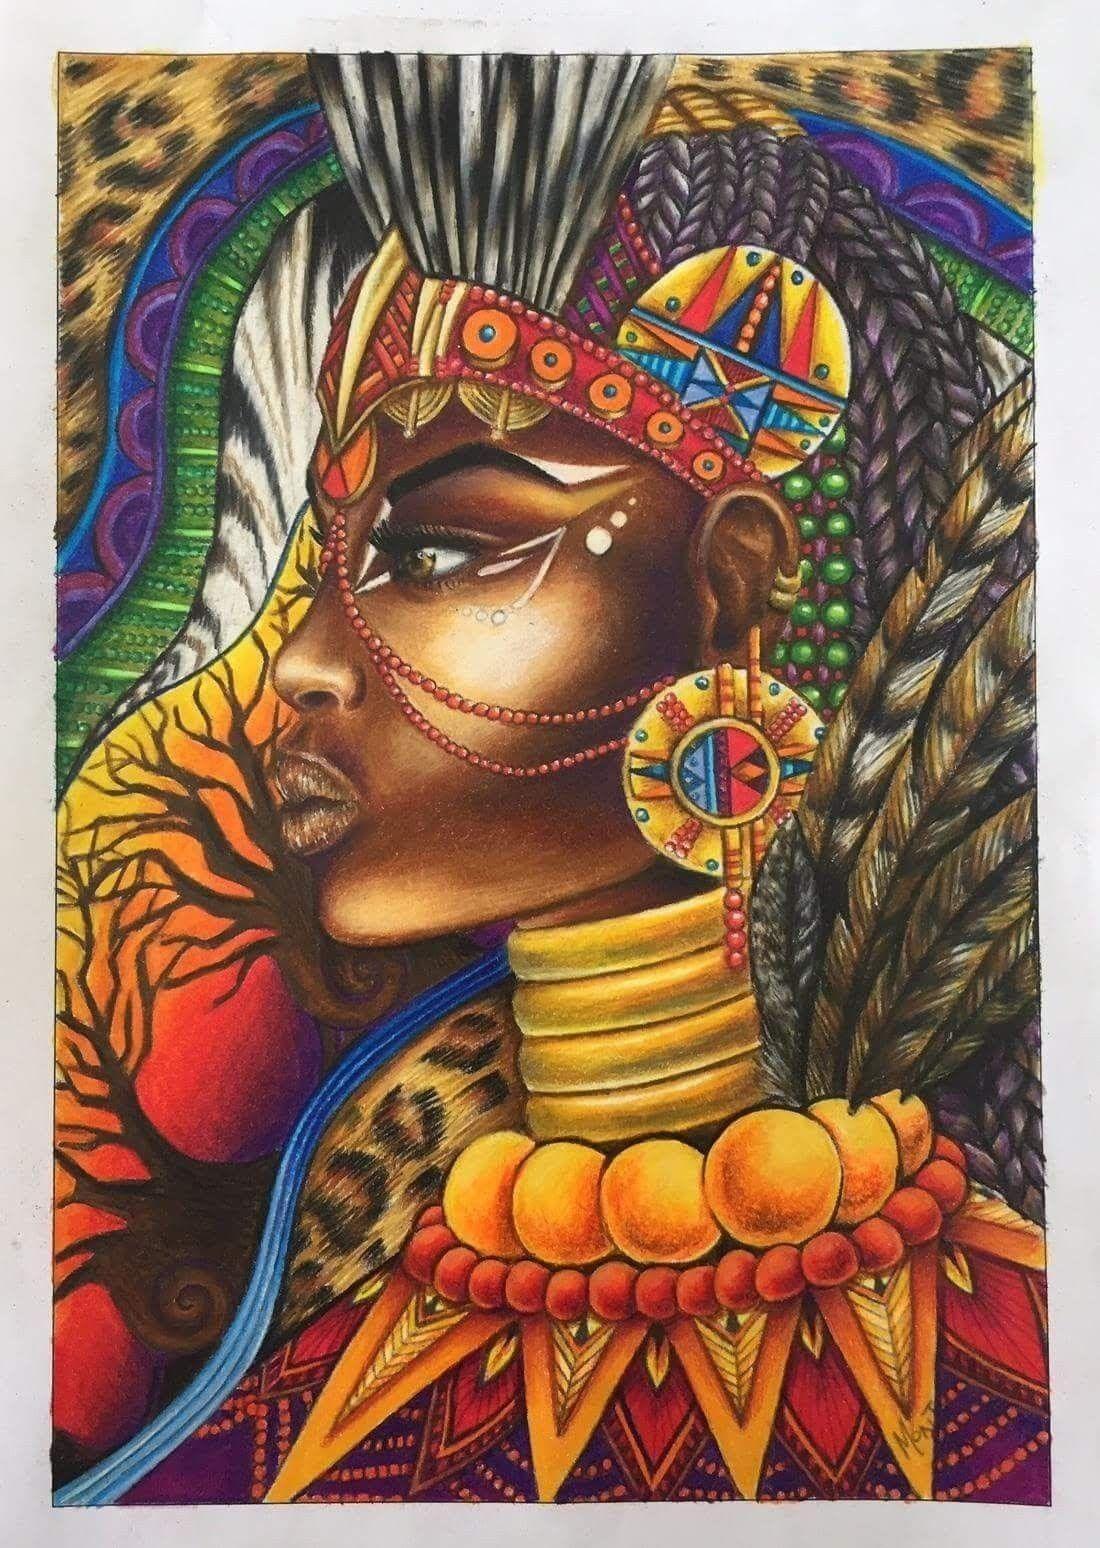 Pin by Tama Sama on Black art | Black love art, African